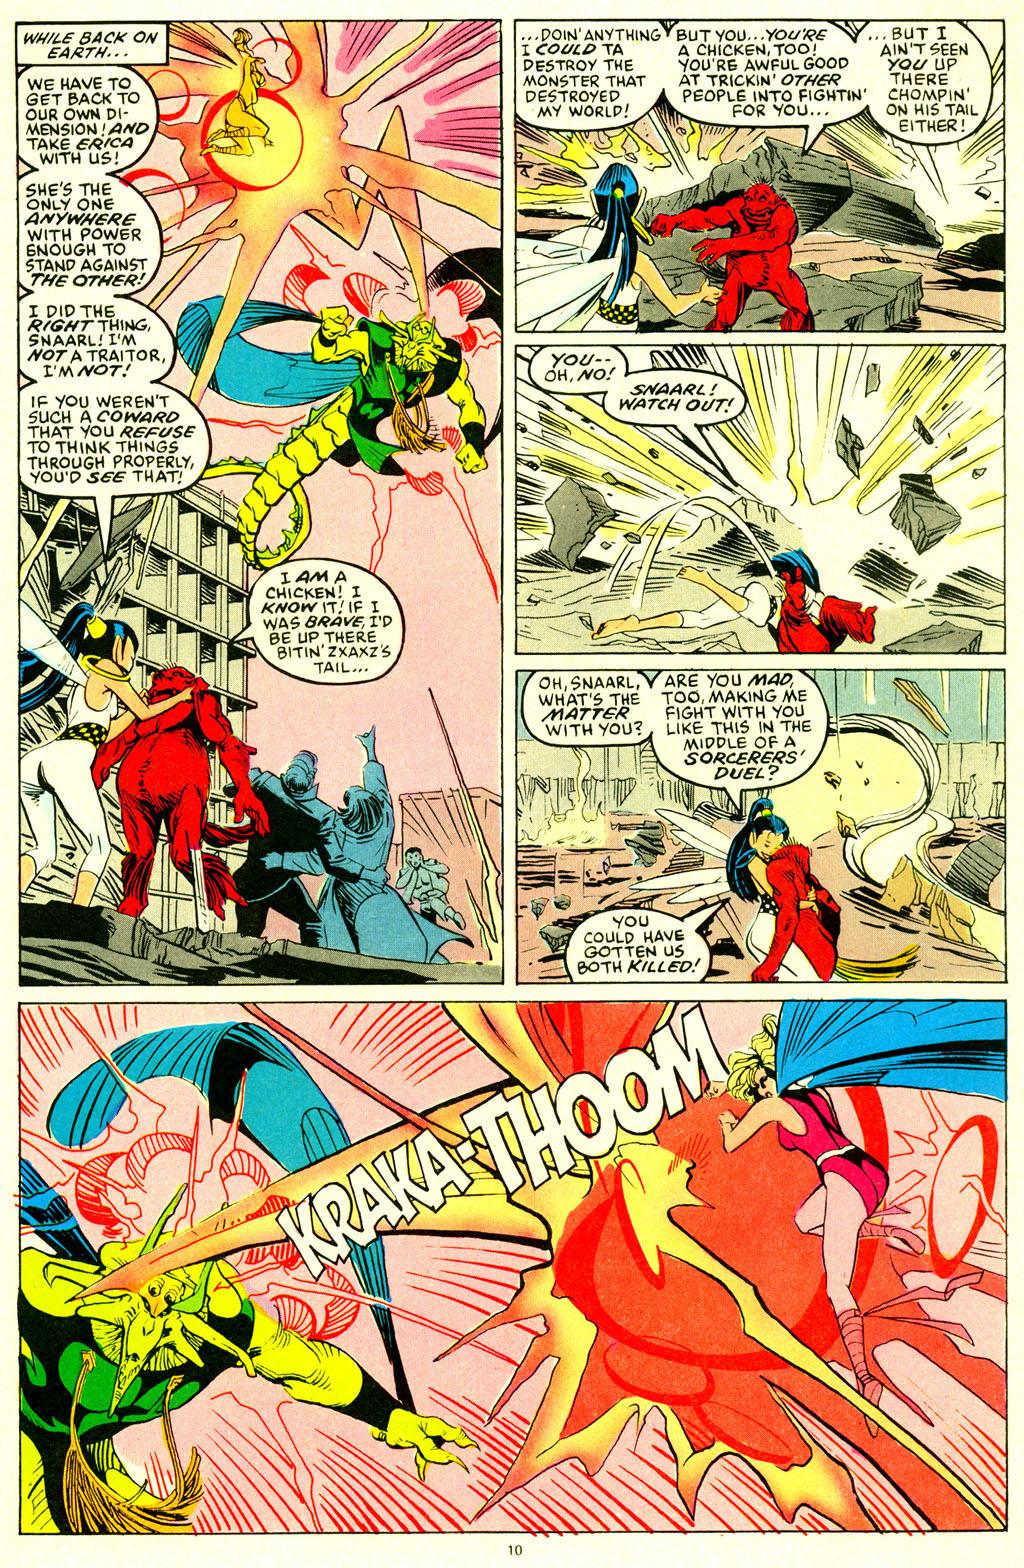 Read online Spellbound comic -  Issue #6 - 11